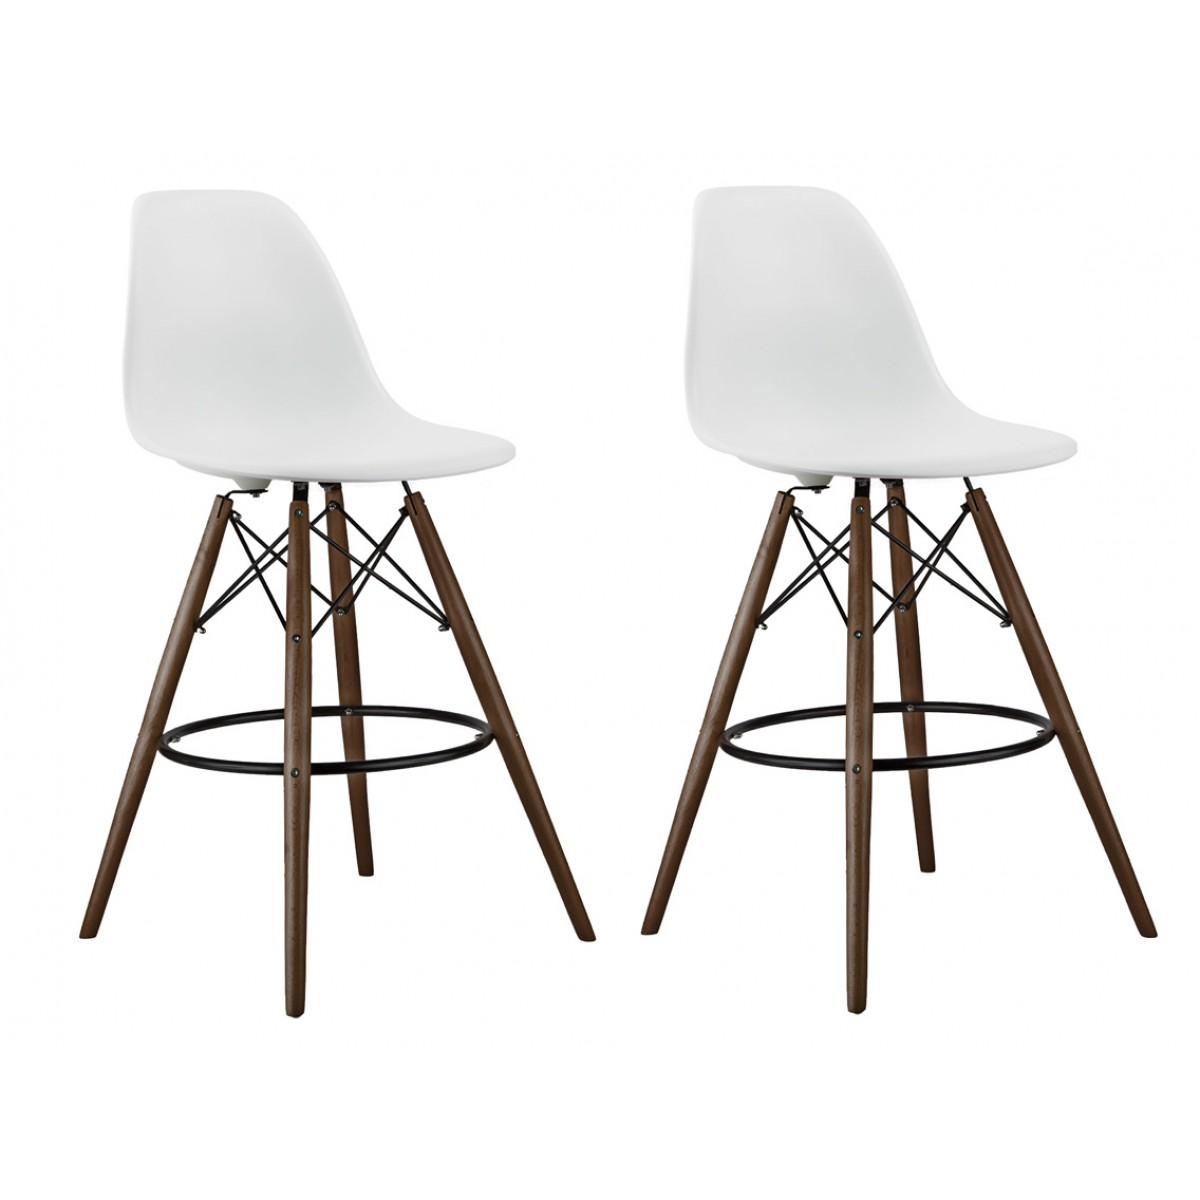 Set Of 2 White Eames Style Dsw Stool With Dark Walnut Wood Eiffel Legs